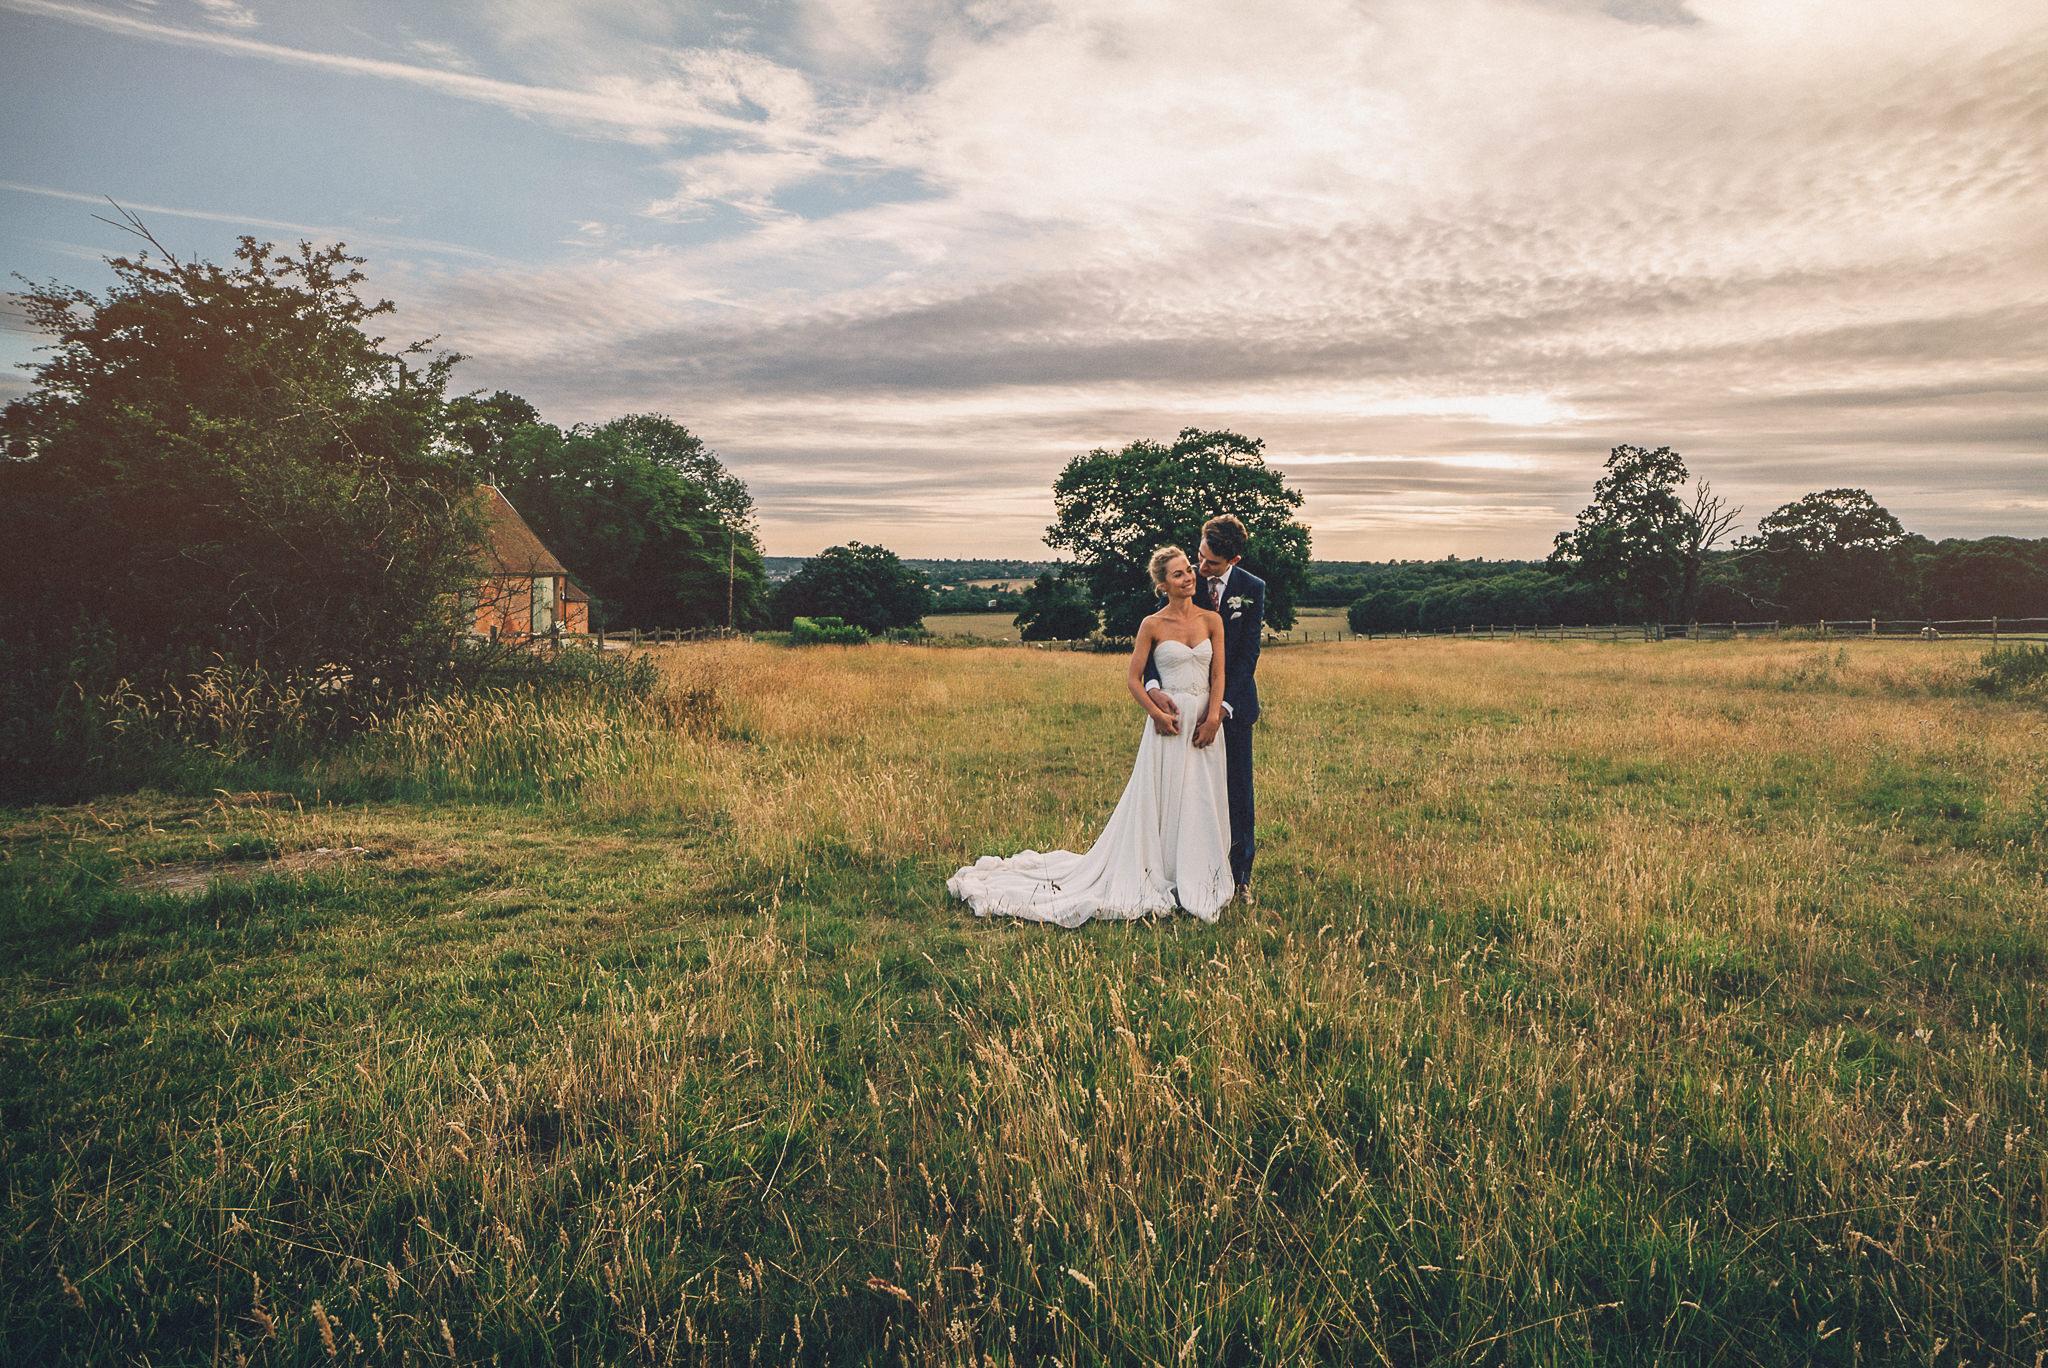 paul-marbrook-Gaynes-Park Wedding-Photographer-90131